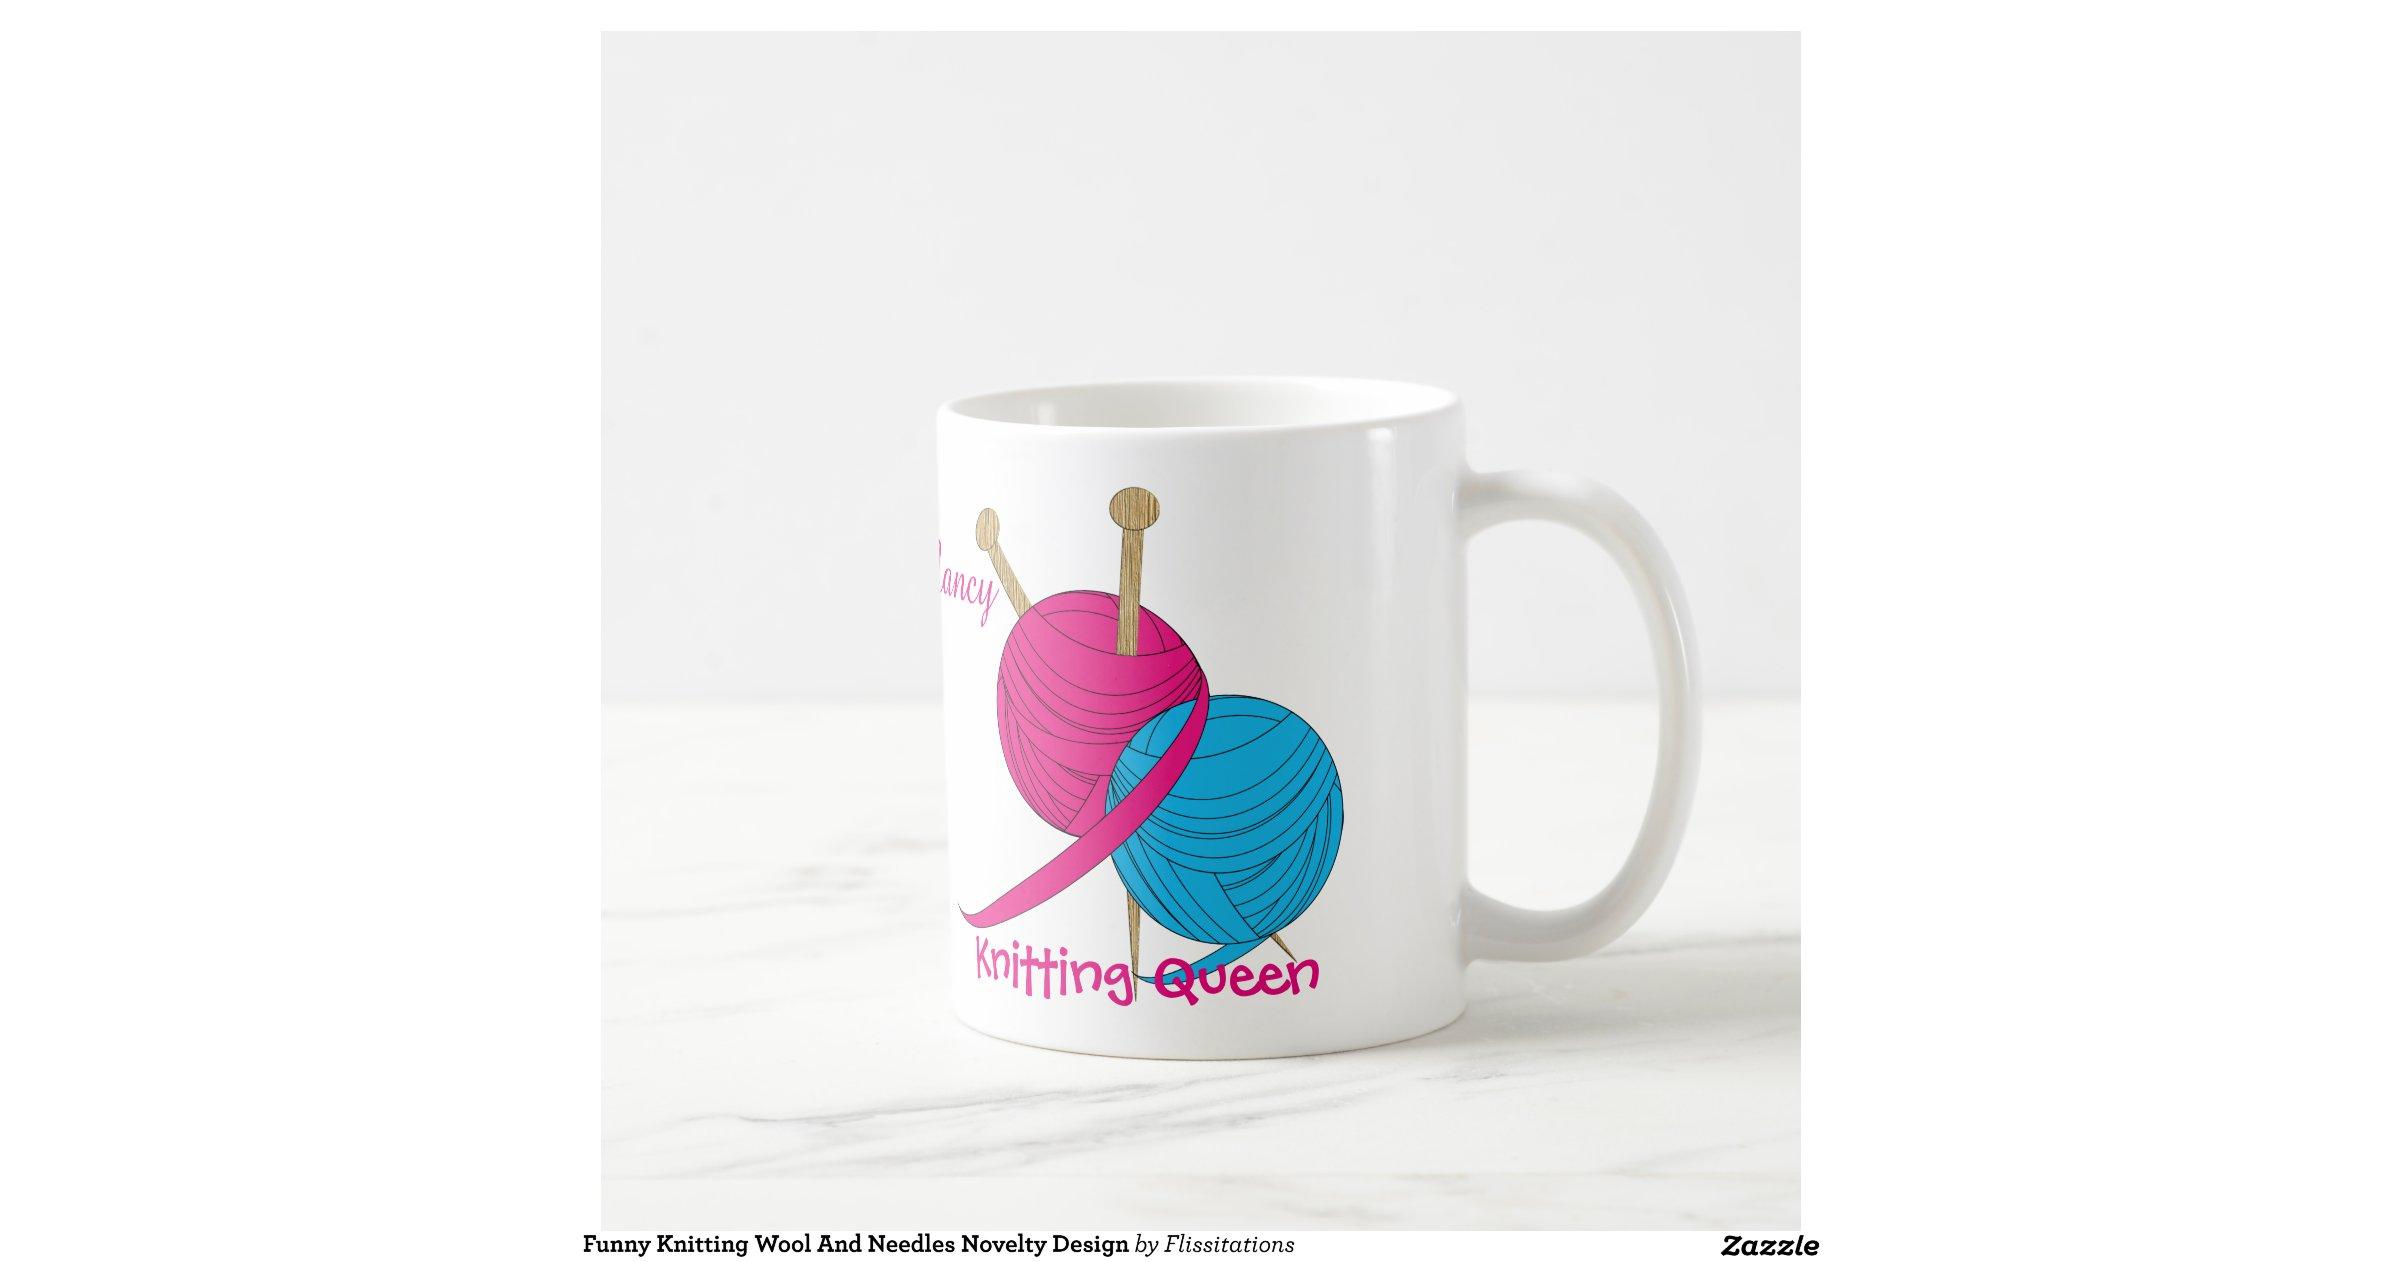 Knitting Needles Novelty : Funny knitting wool and needles novelty design classic